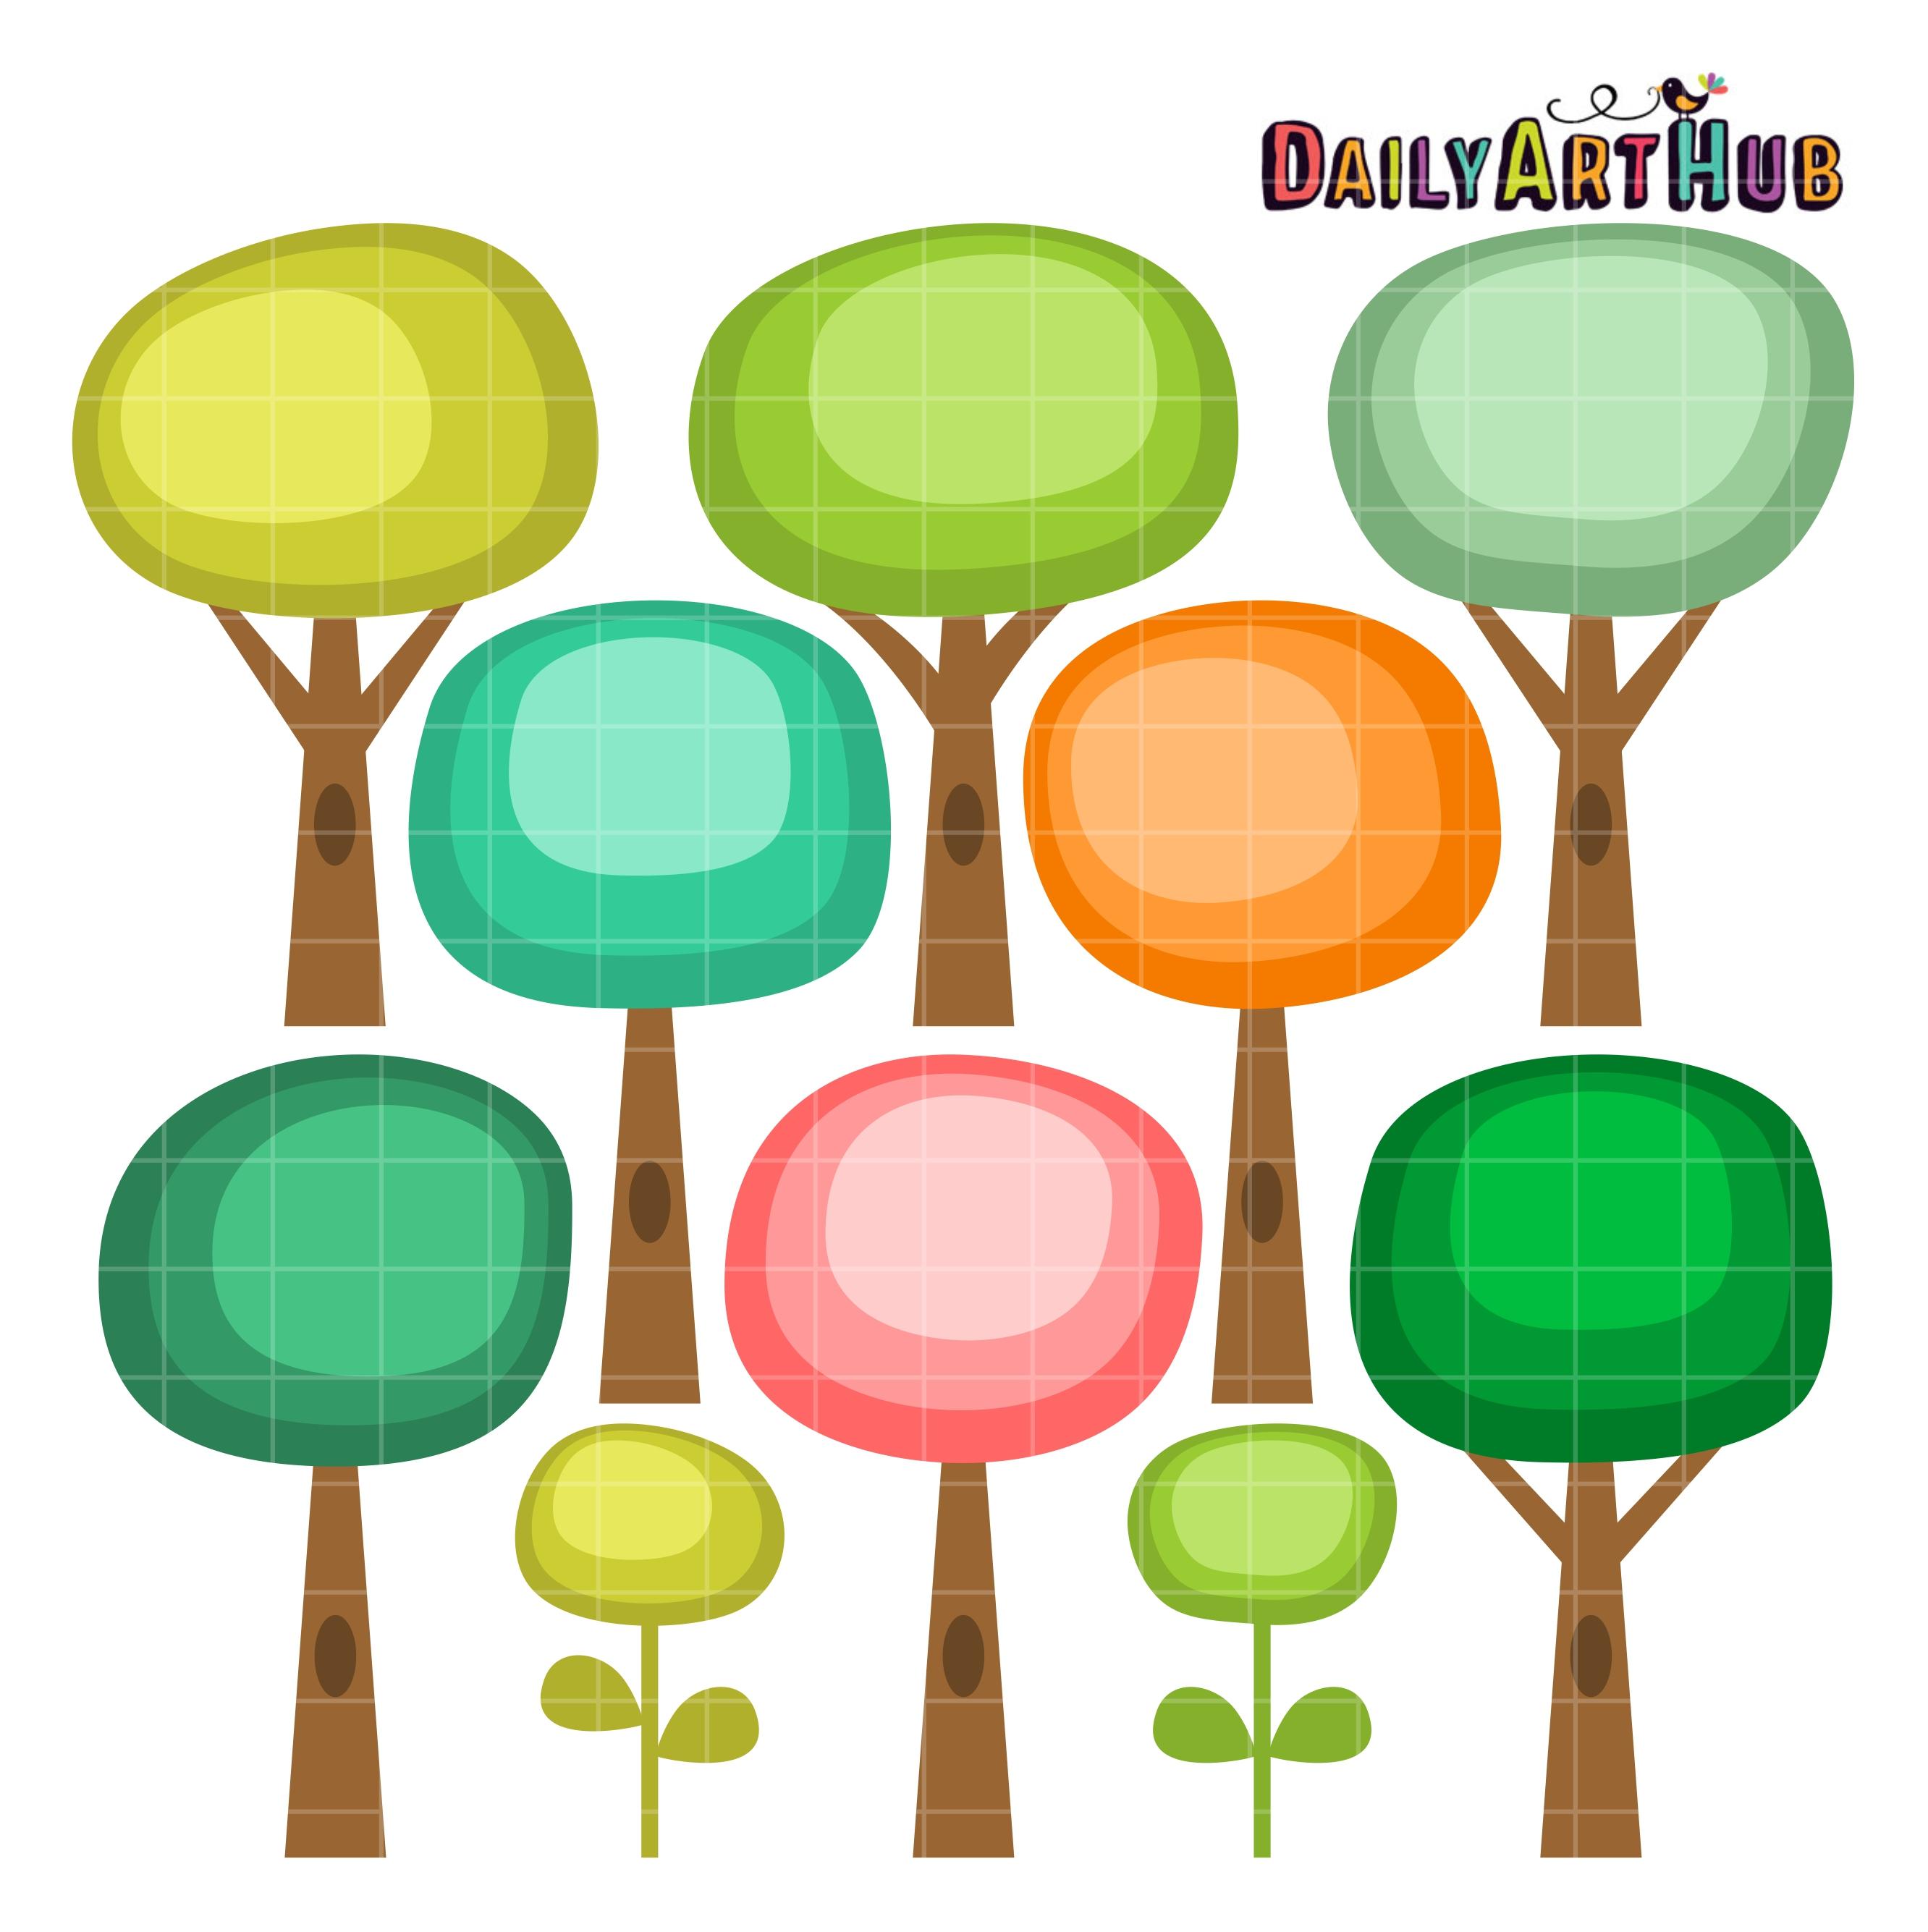 Round Cute Trees Clip Art Set – Daily Art Hub – Free Clip ...